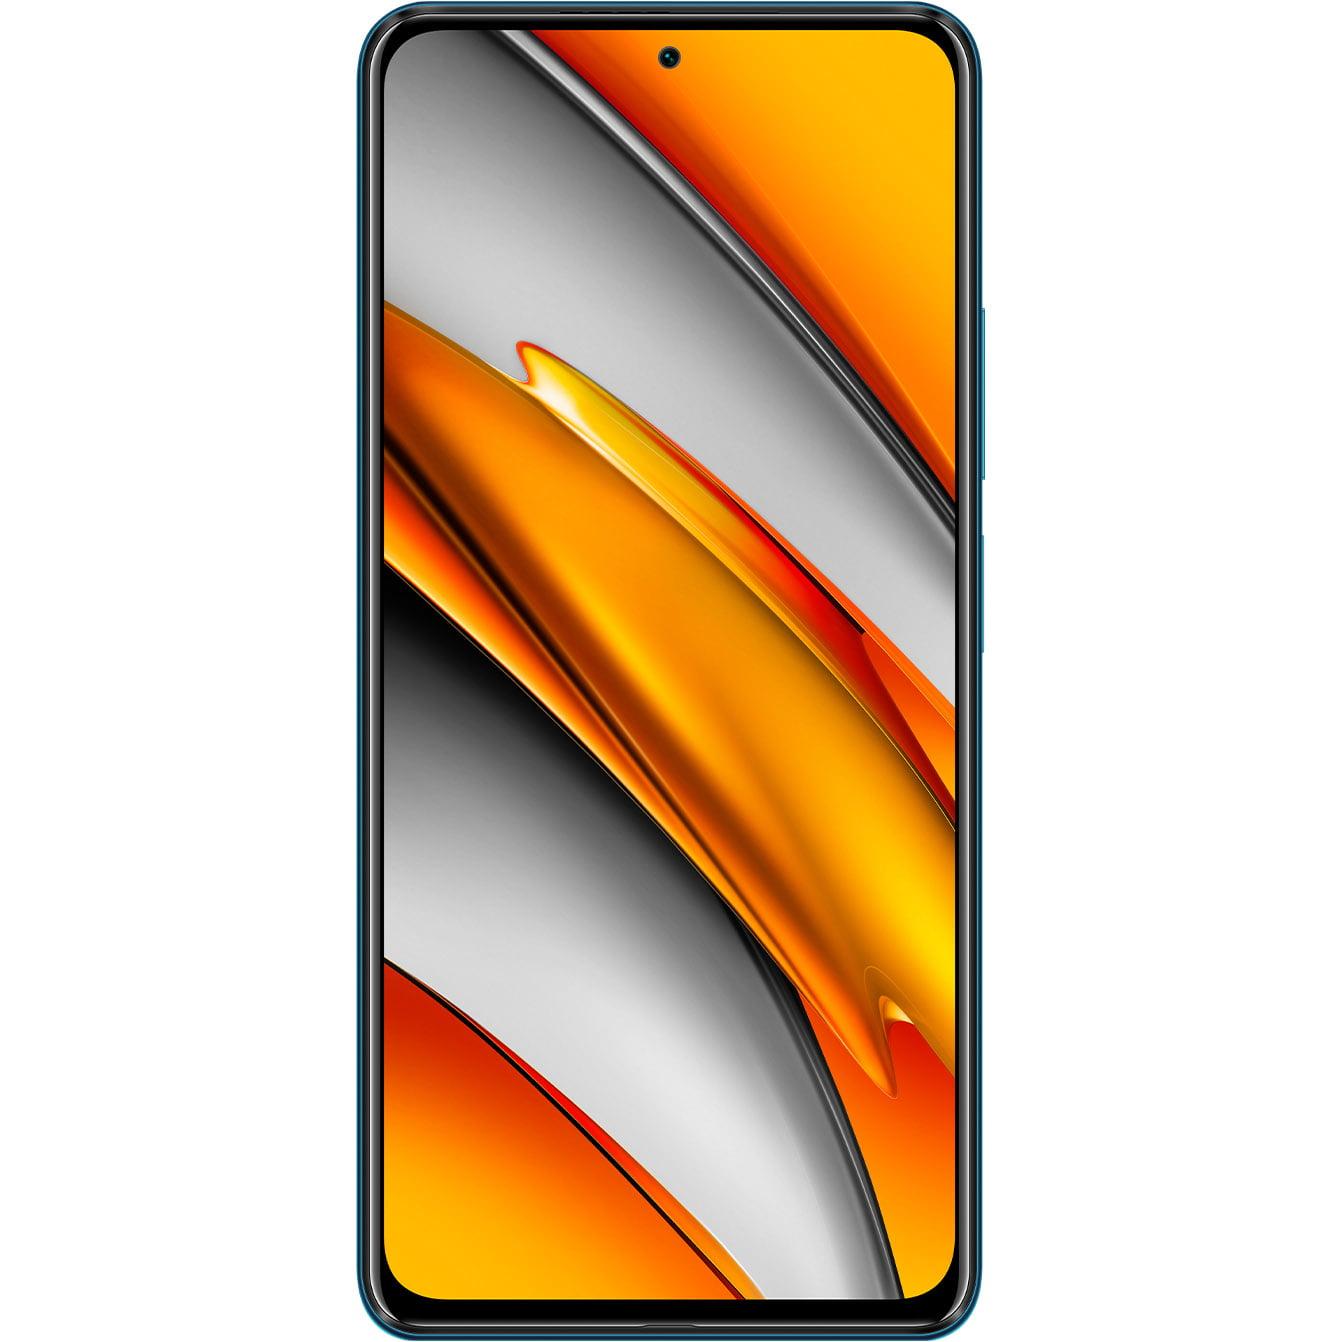 Telefon mobil Xiaomi Poco F3, Dual SIM, 128GB, 6GB RAM, 5G, Ocean Blue